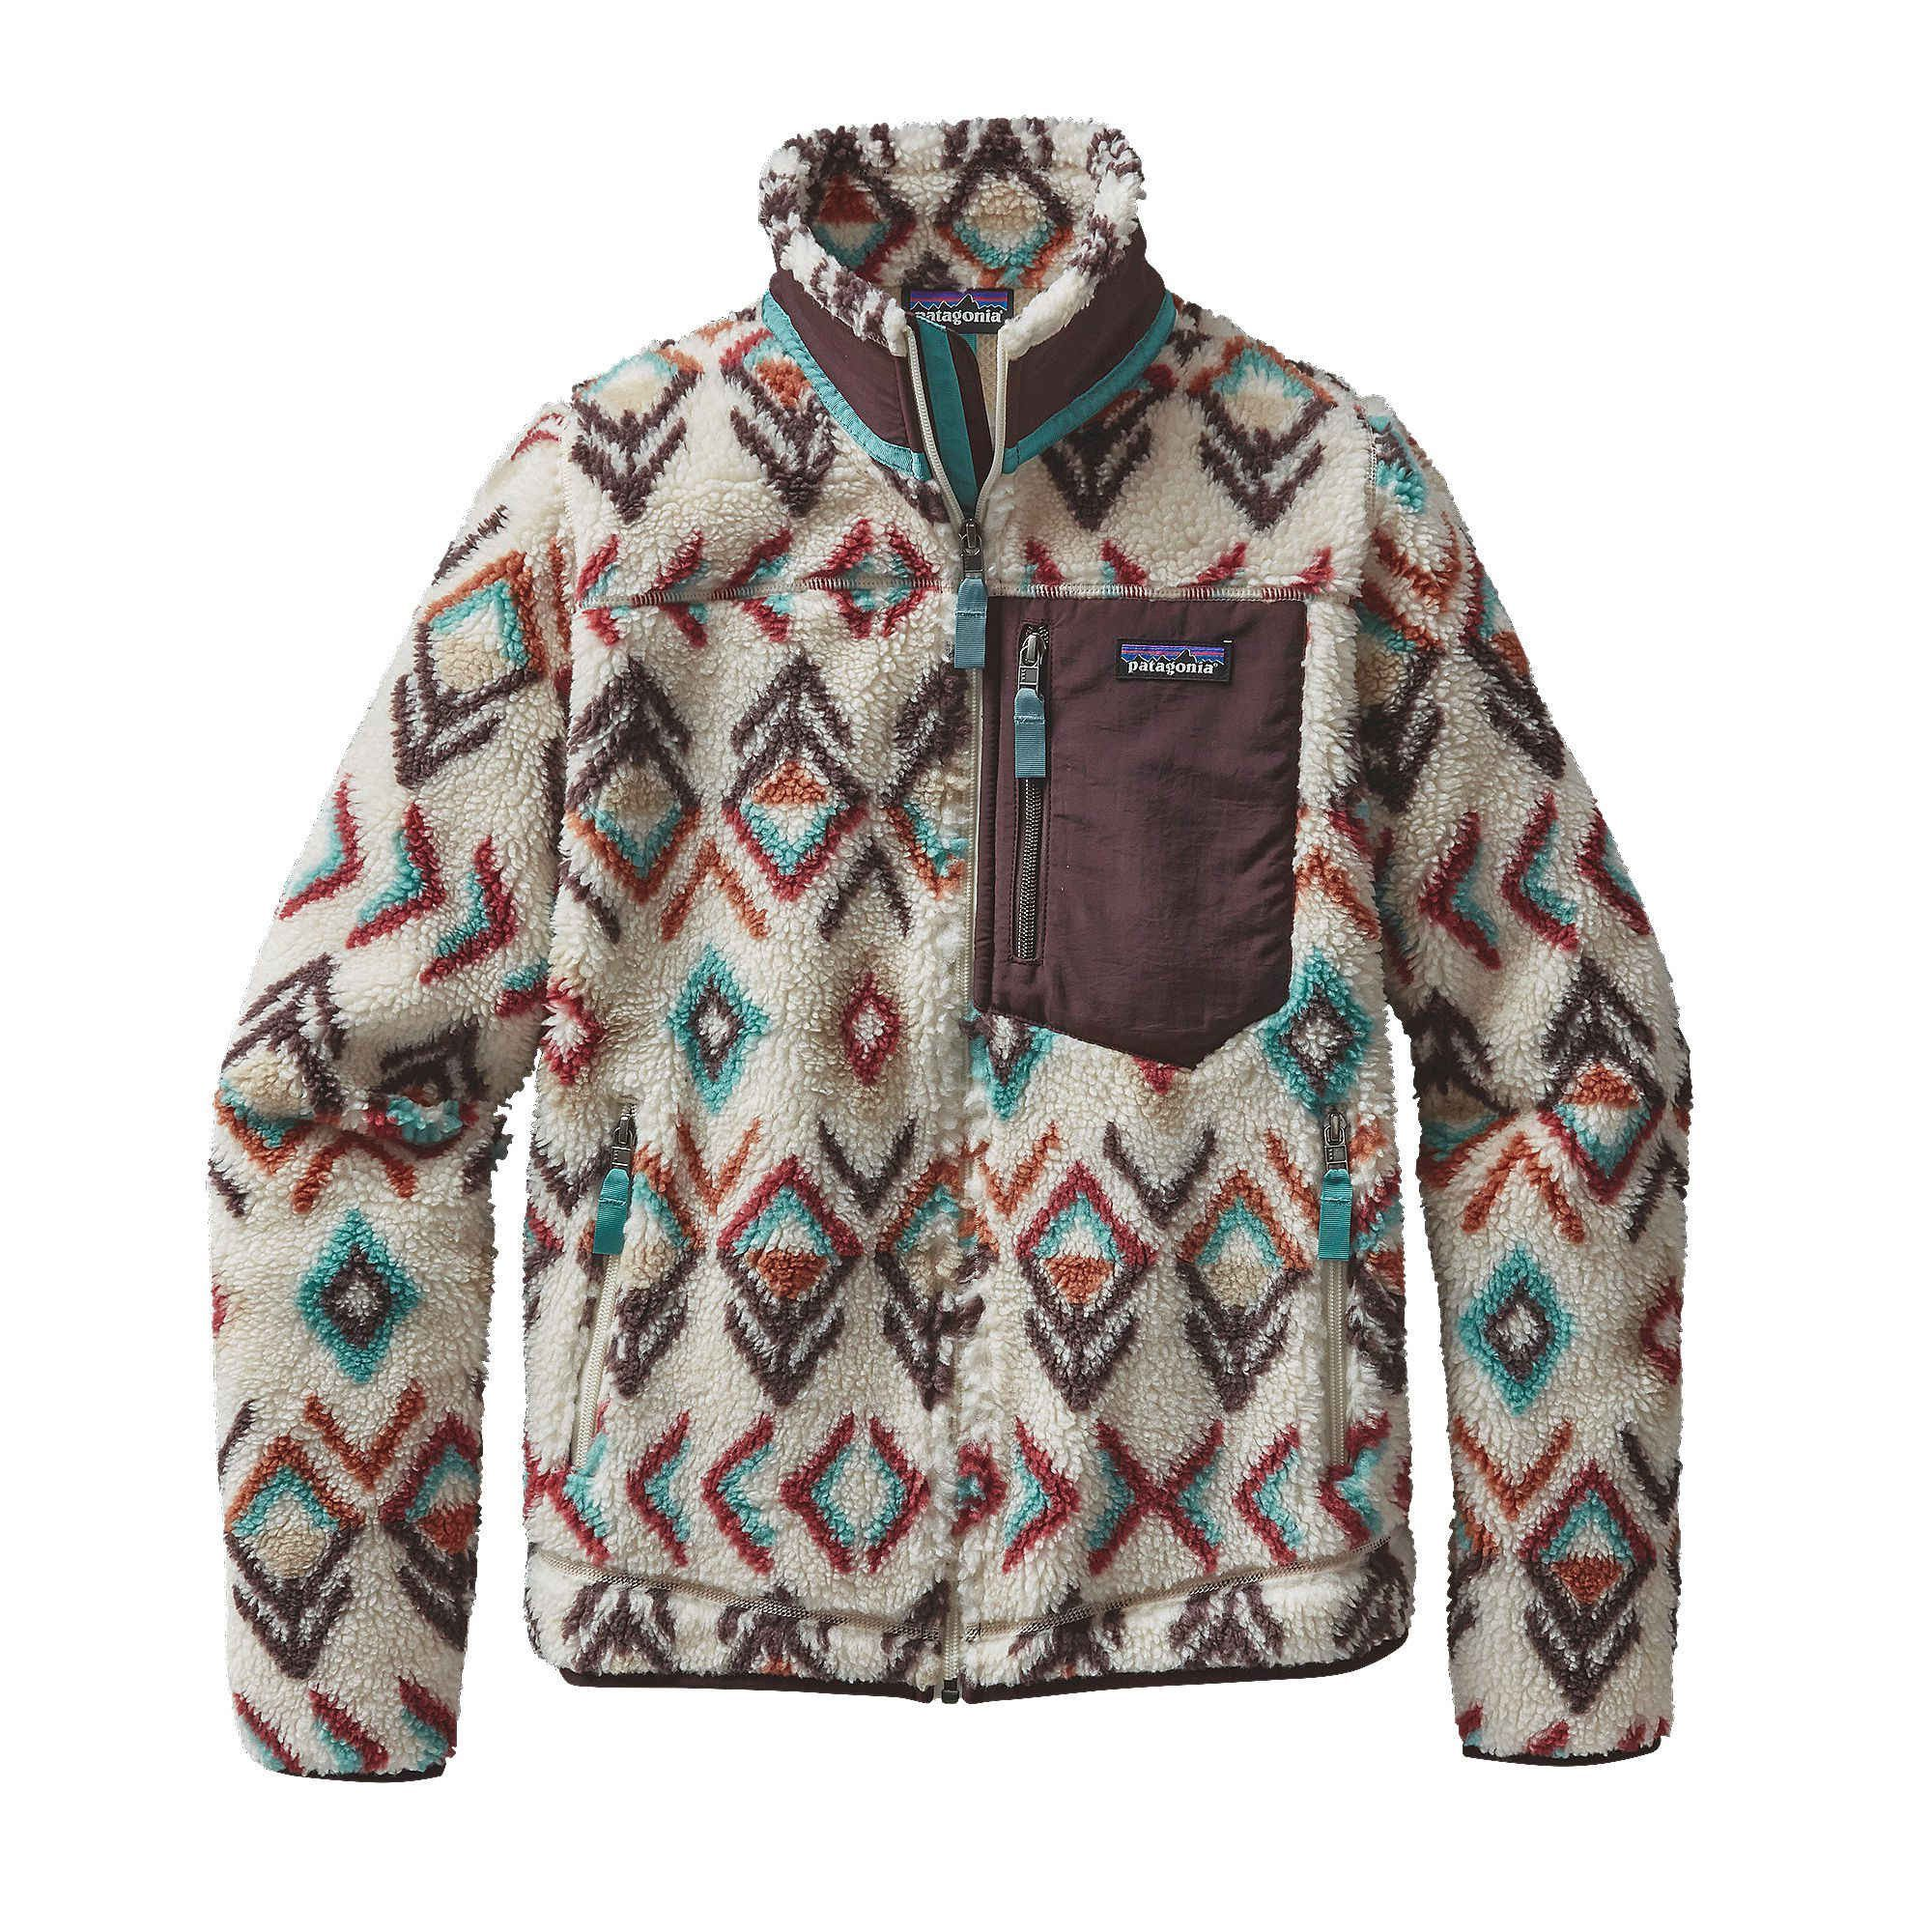 81d11b95b6 Patagonia Women's Classic Retro-X Jacket | My style | Fashion ...